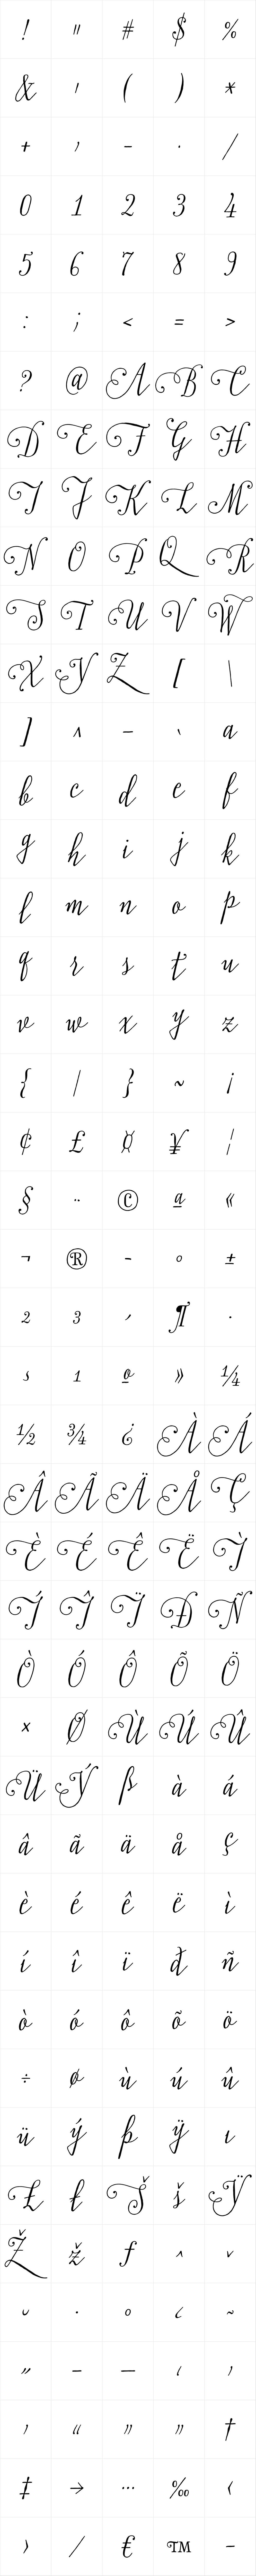 Typnic Script Swash